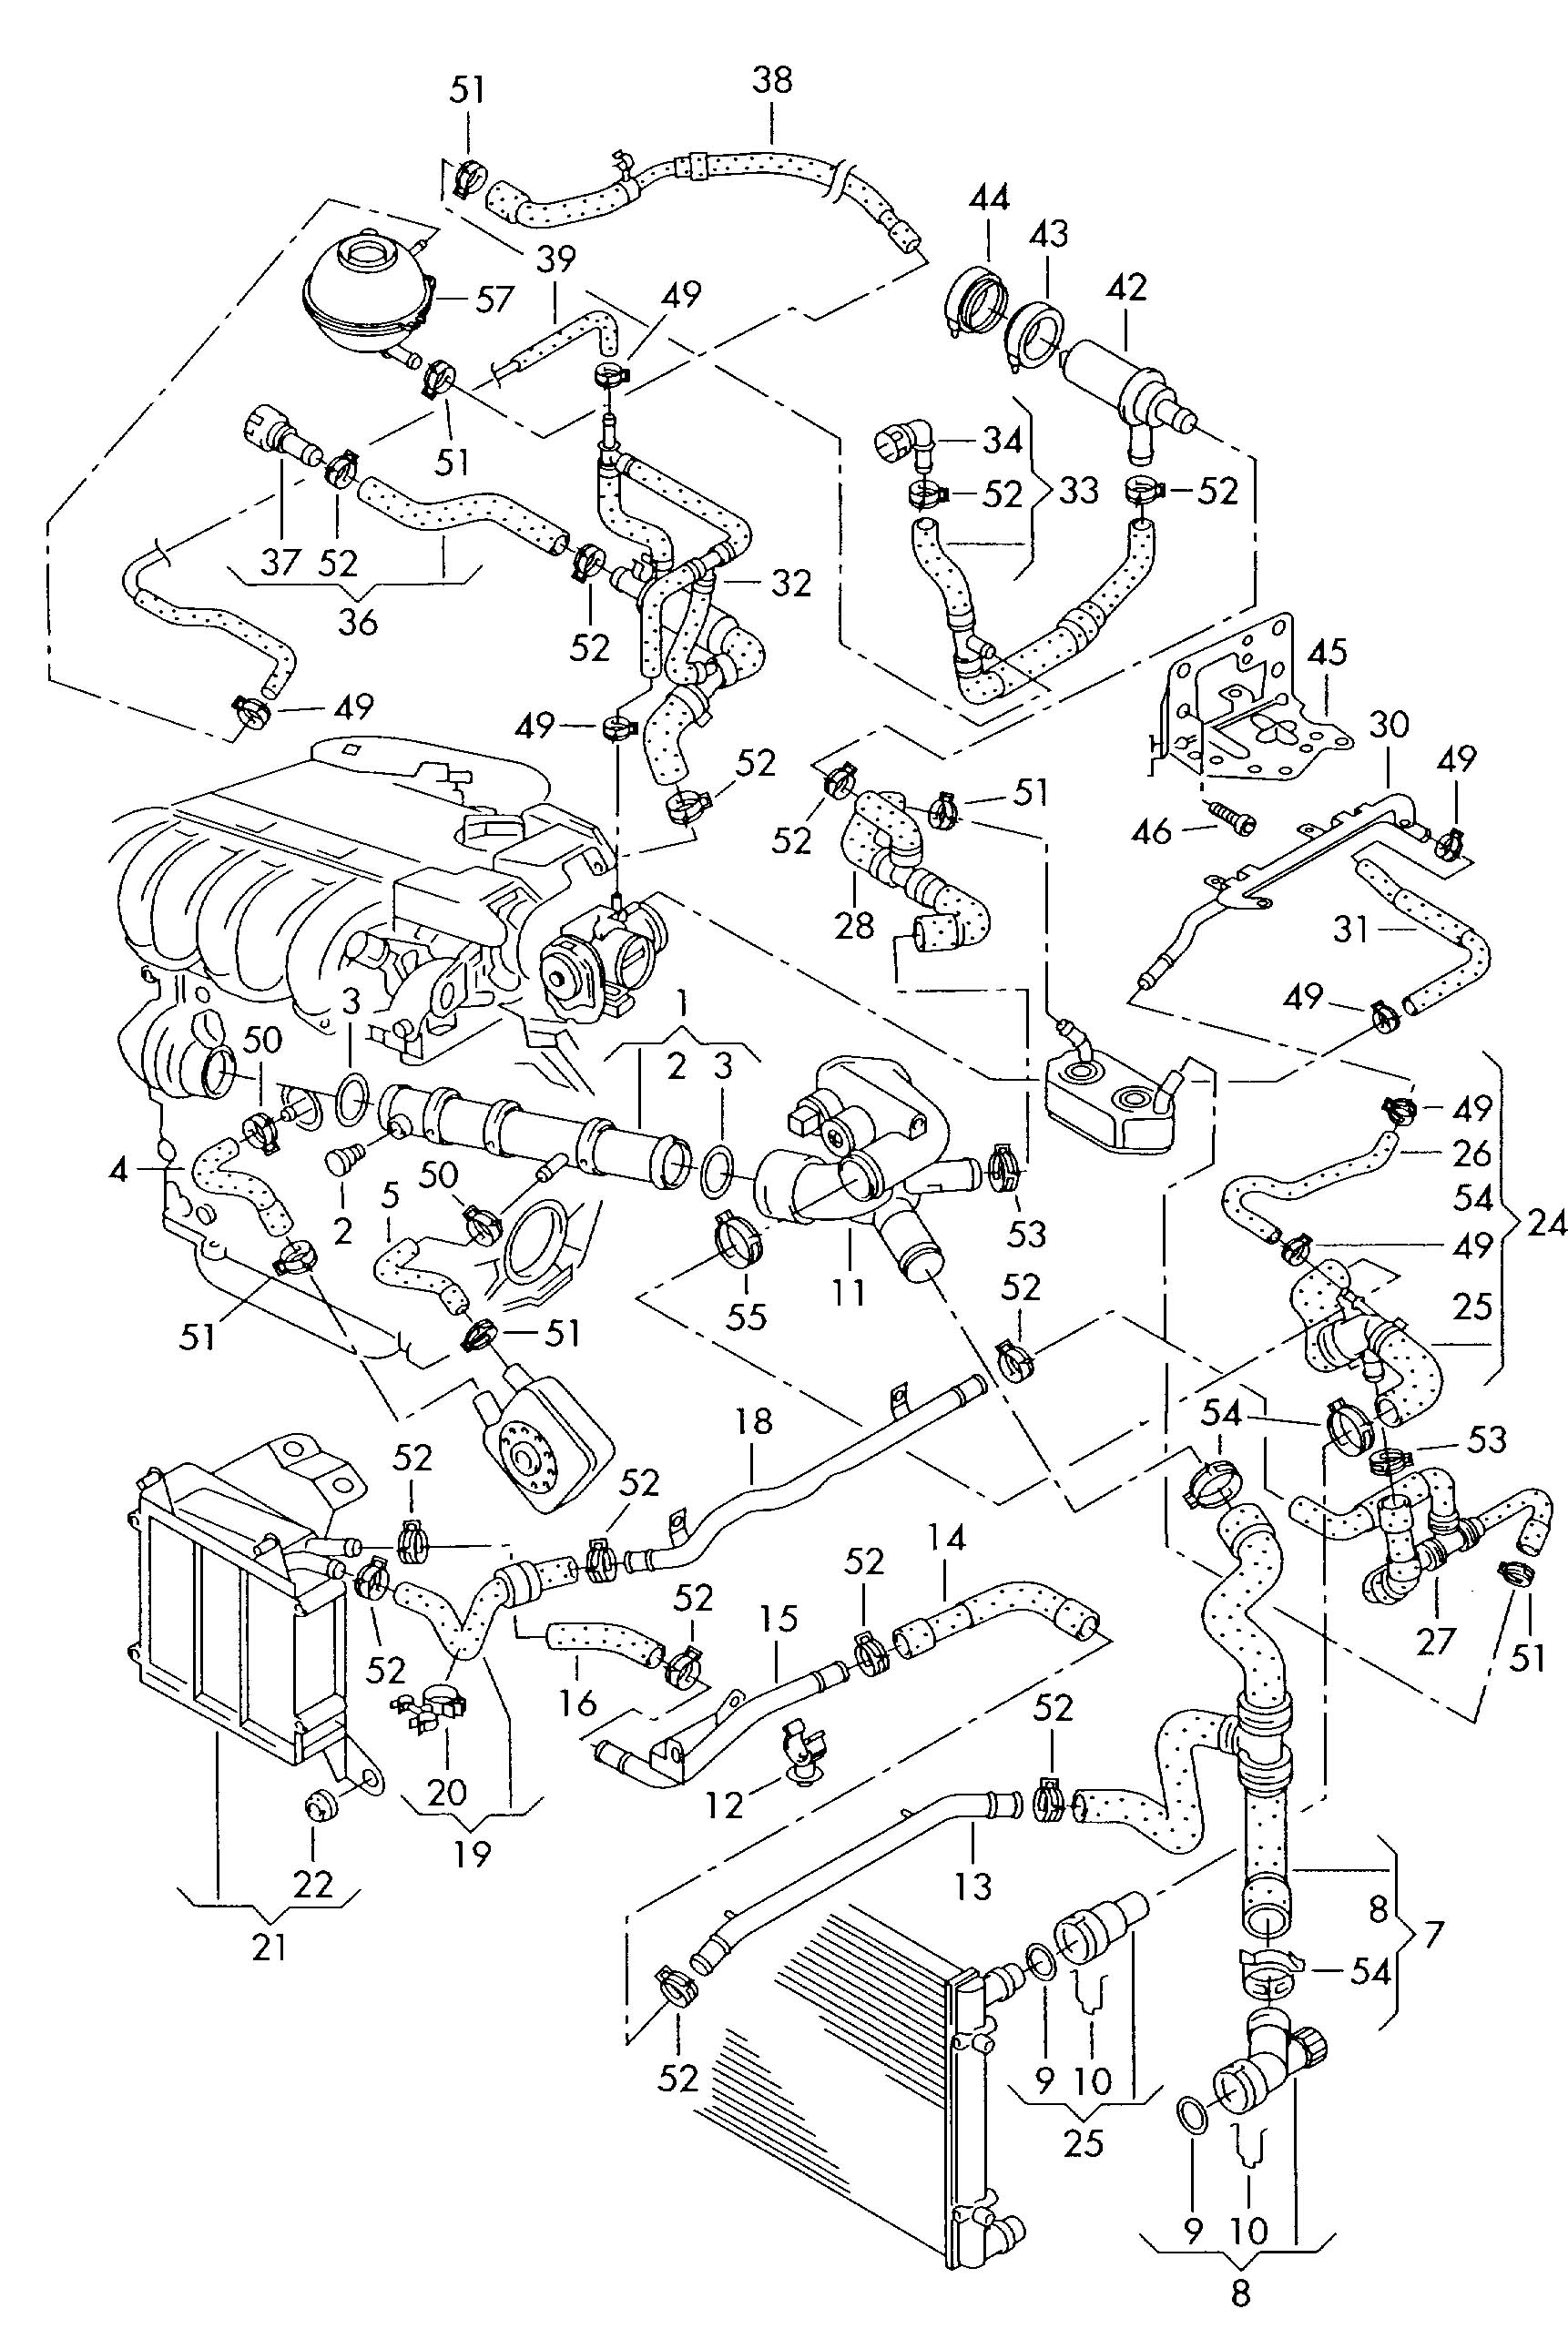 hight resolution of vw jetta 2 0 engine wiring diagram wiring library rh 93 codingcommunity de mk4 jetta 2 0 engine diagram 2002 jetta engine diagram